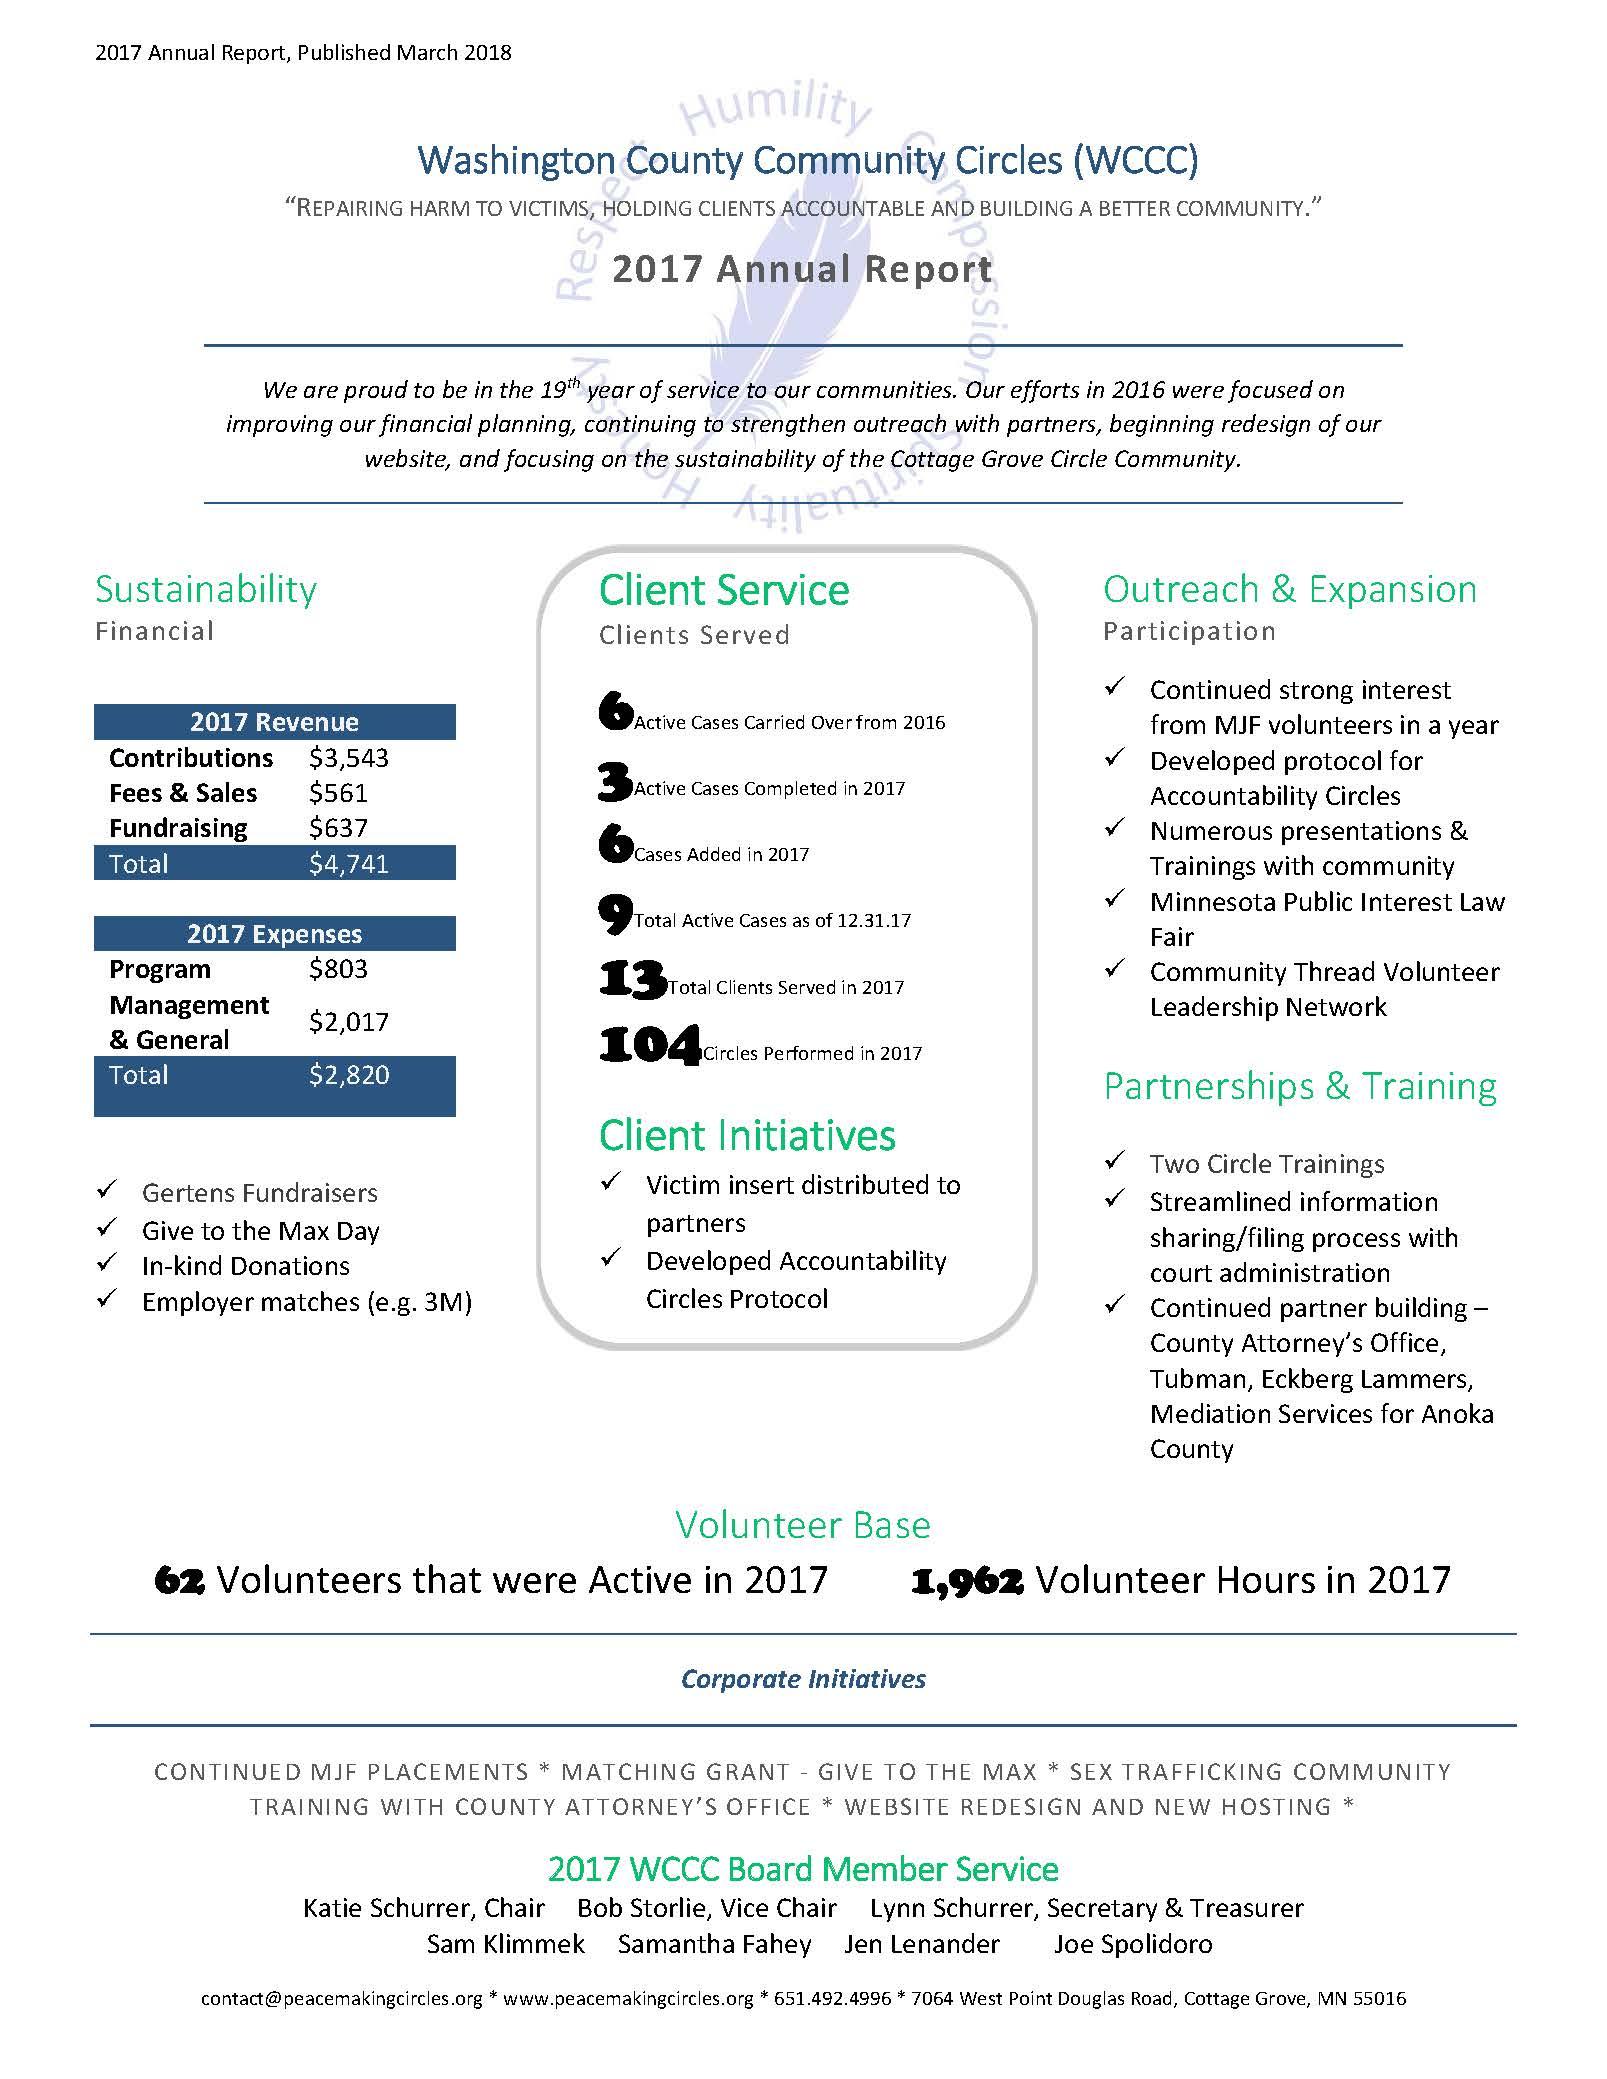 2018 Annual Report for 2017 Public.jpg